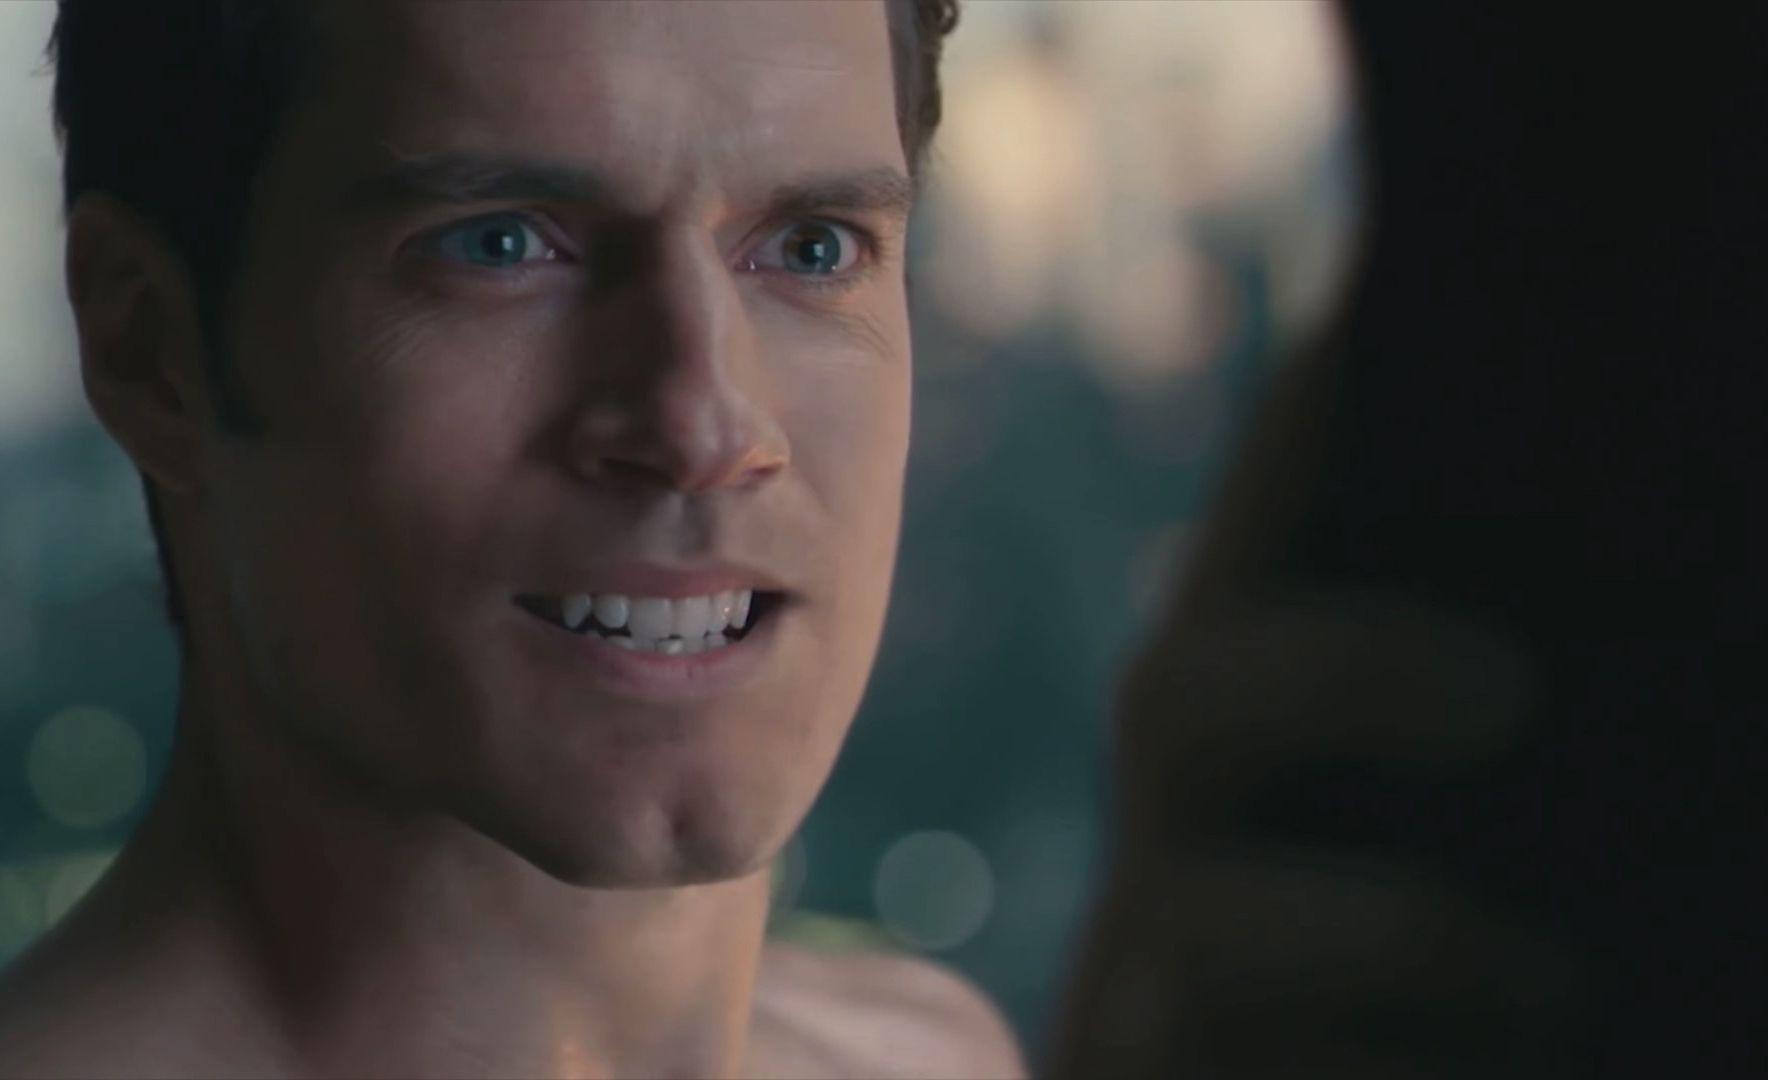 Superman with fake moustache cgi